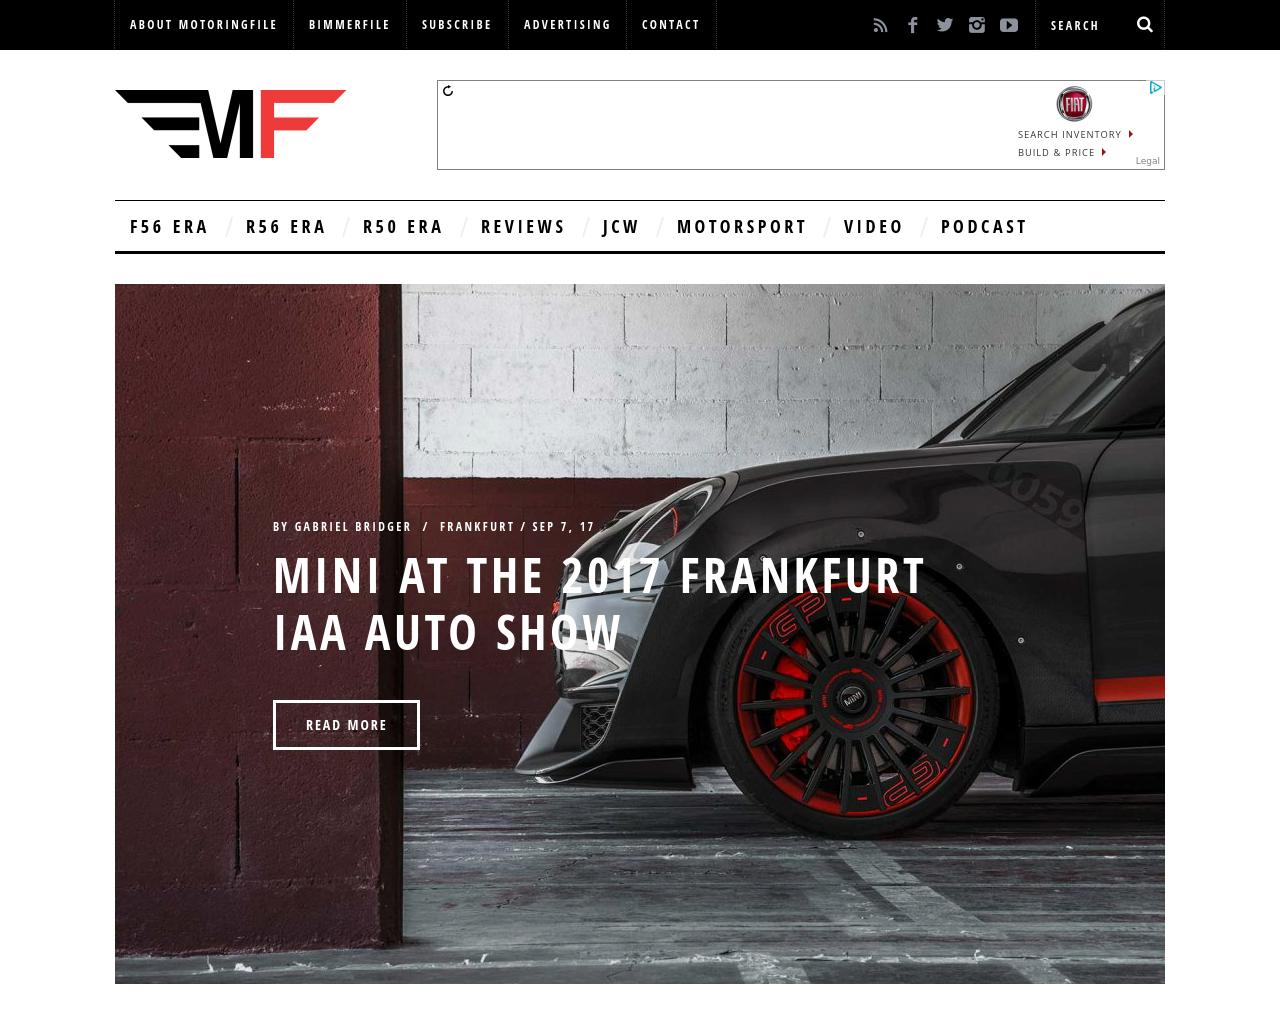 MotoringFile-Advertising-Reviews-Pricing